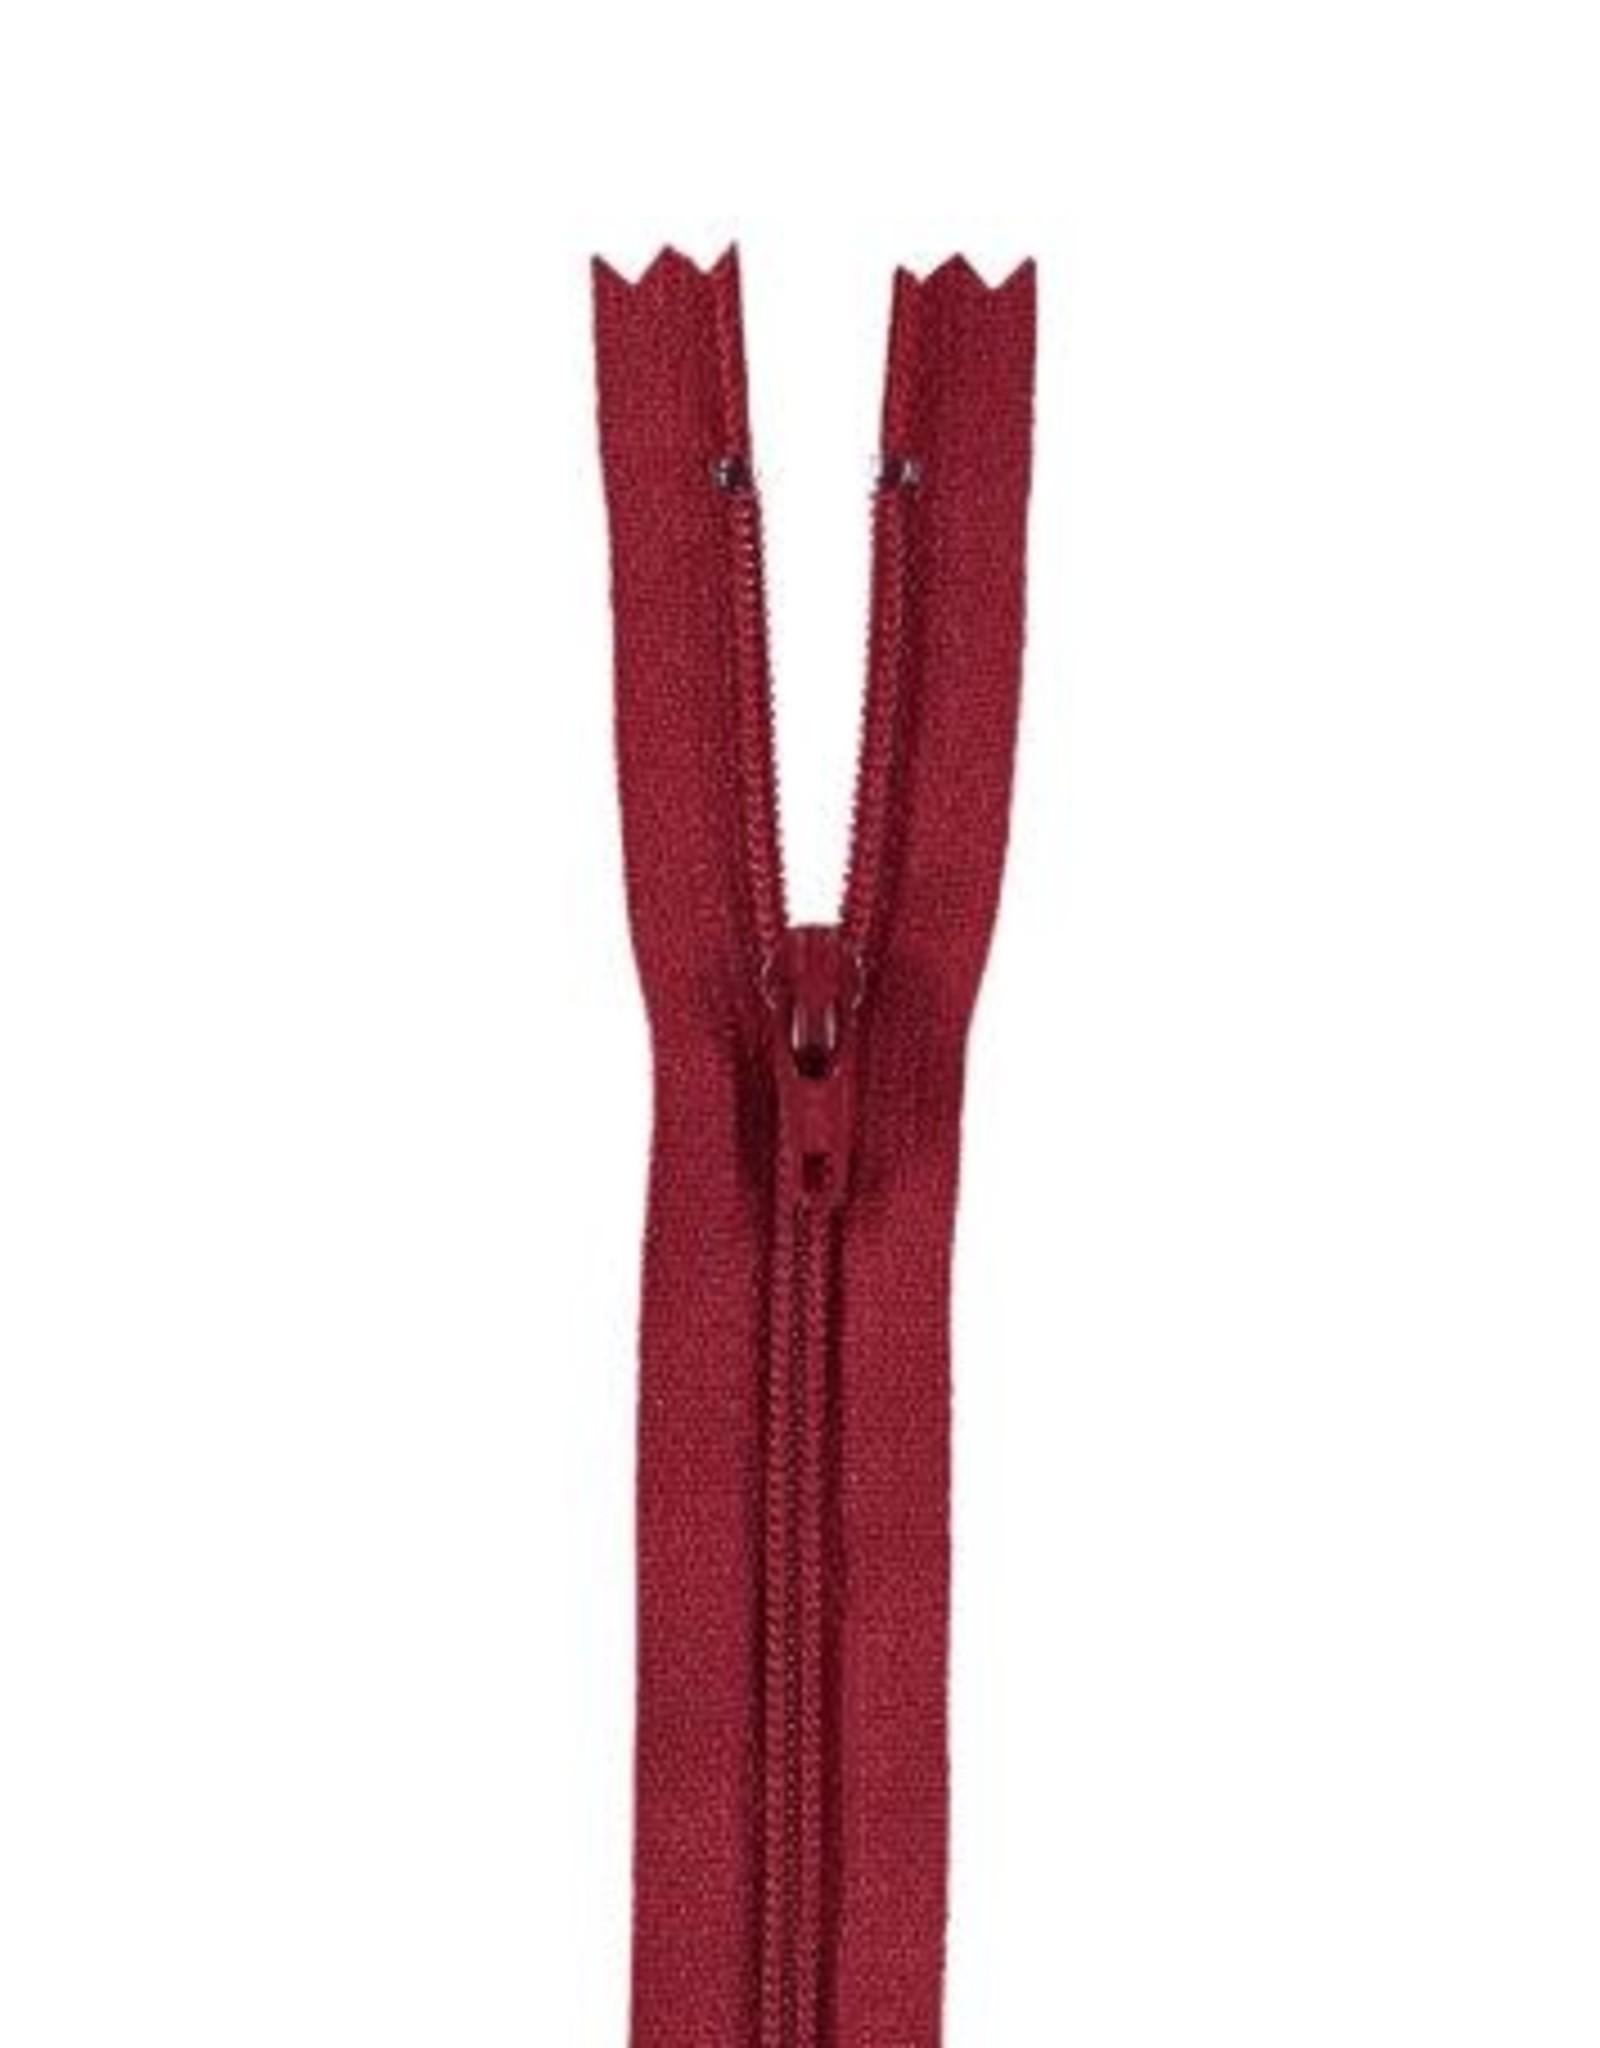 YKK Spiraalrits niet-DB 3mm donker rood 520-15cm